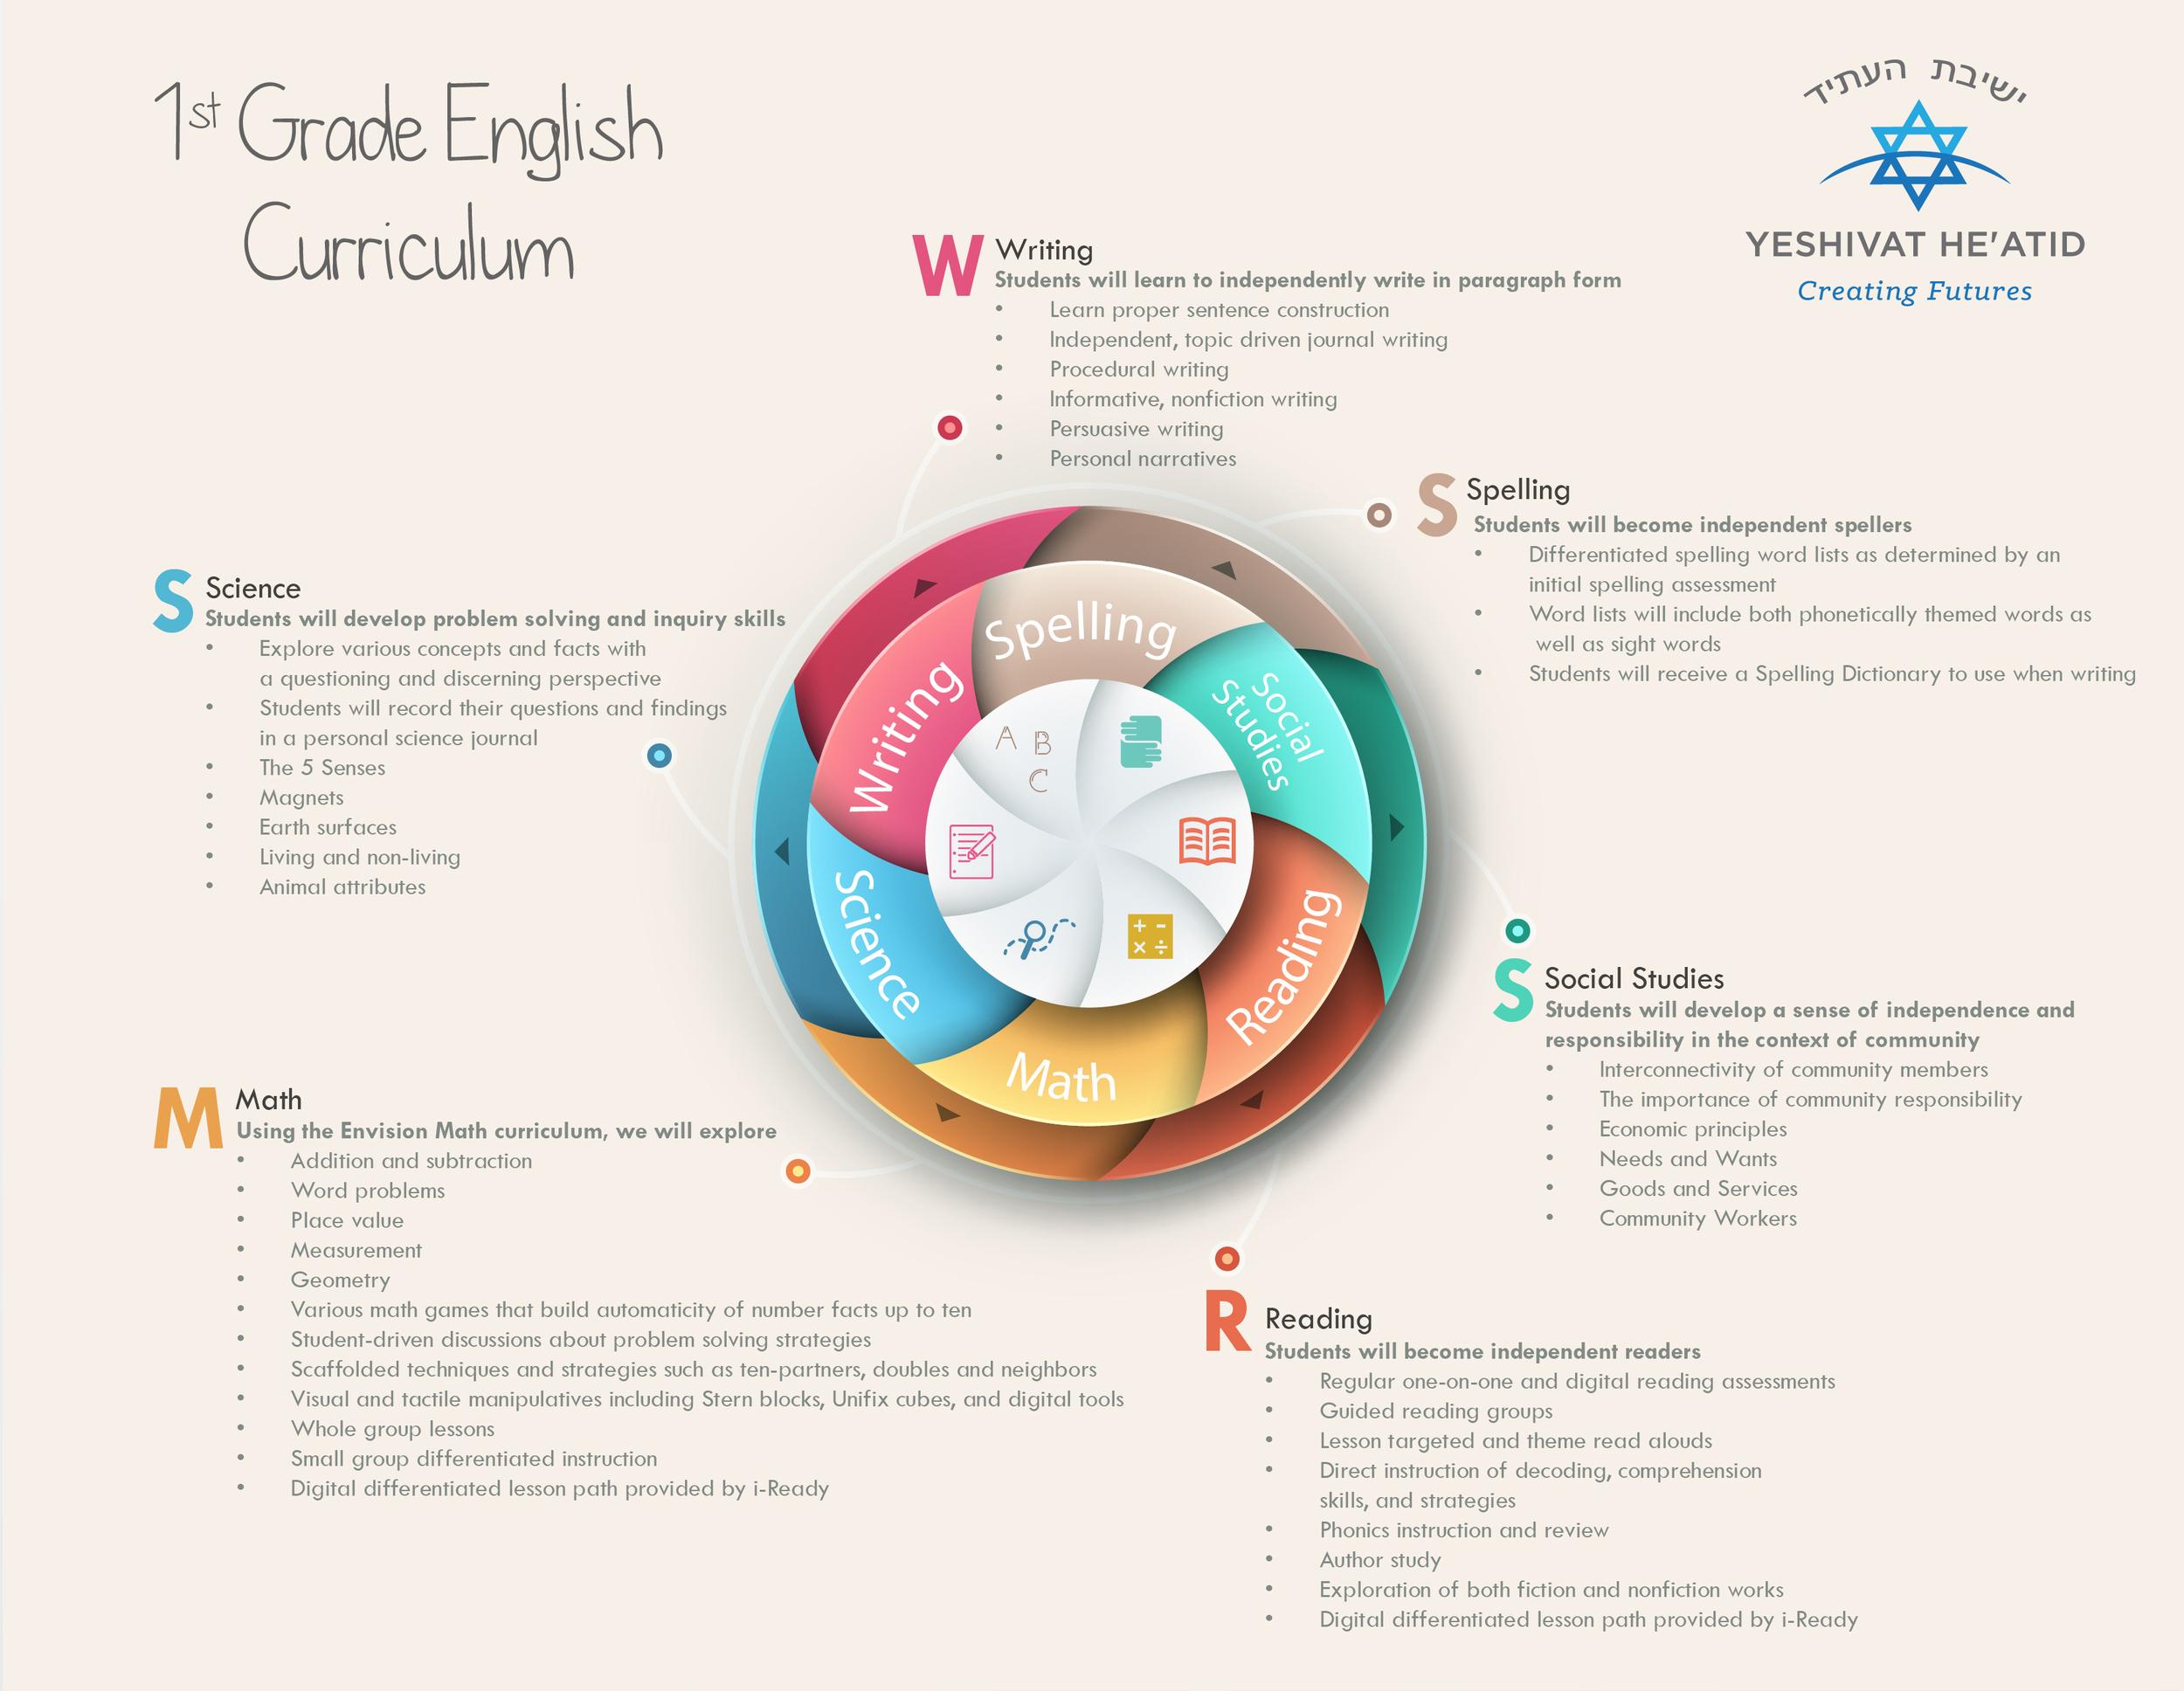 3- 1st Grade English Curriculum.jpg